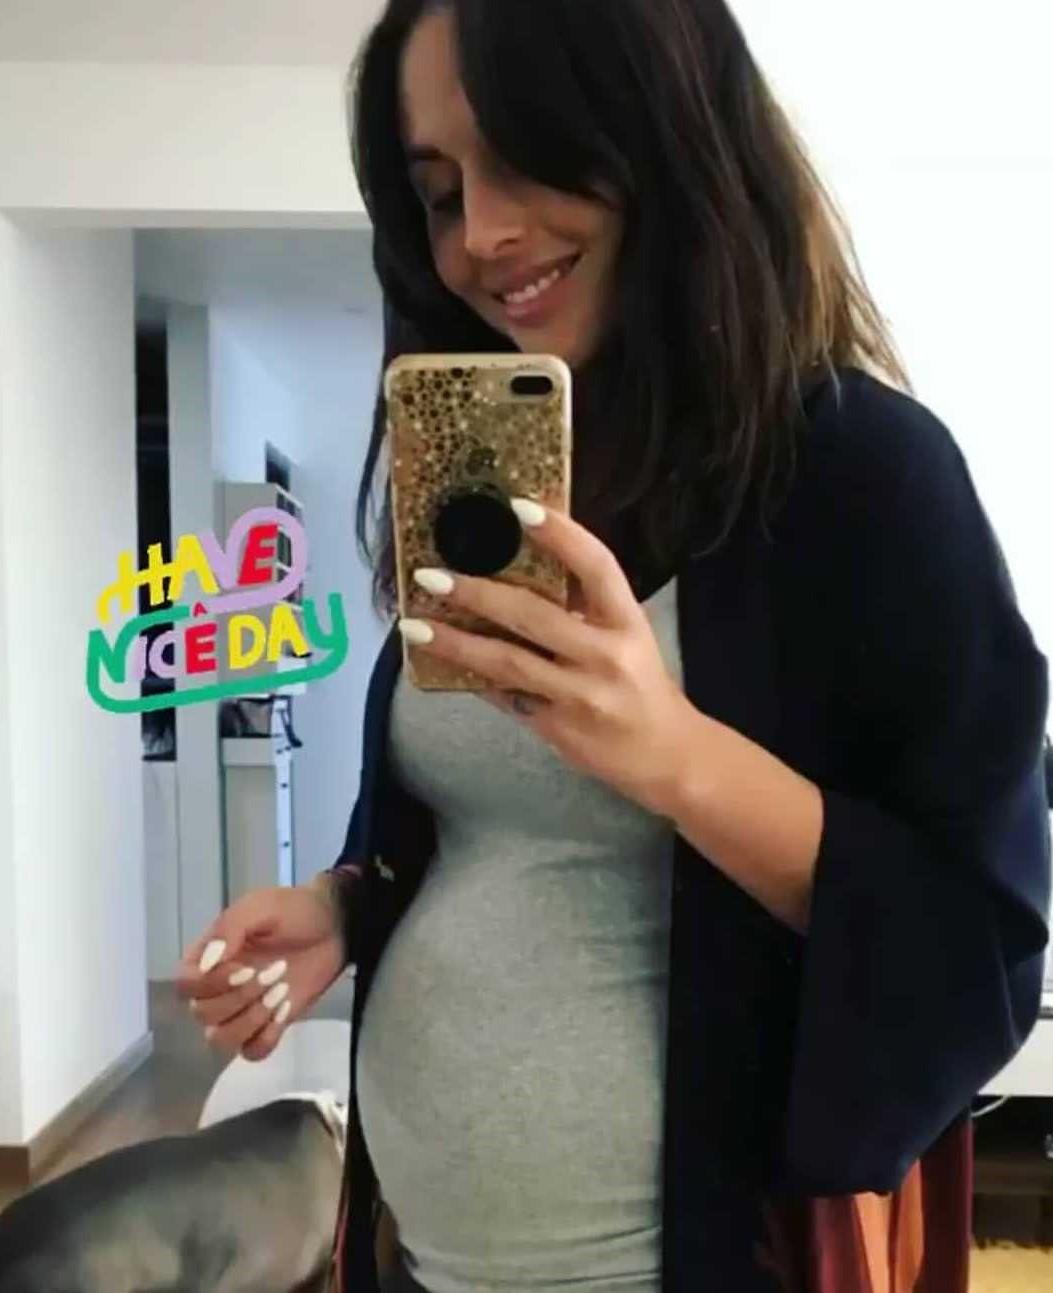 a6c05869d Zuria Vega festeja el  baby shower  de Luka a menos de dos meses de dar a  luz